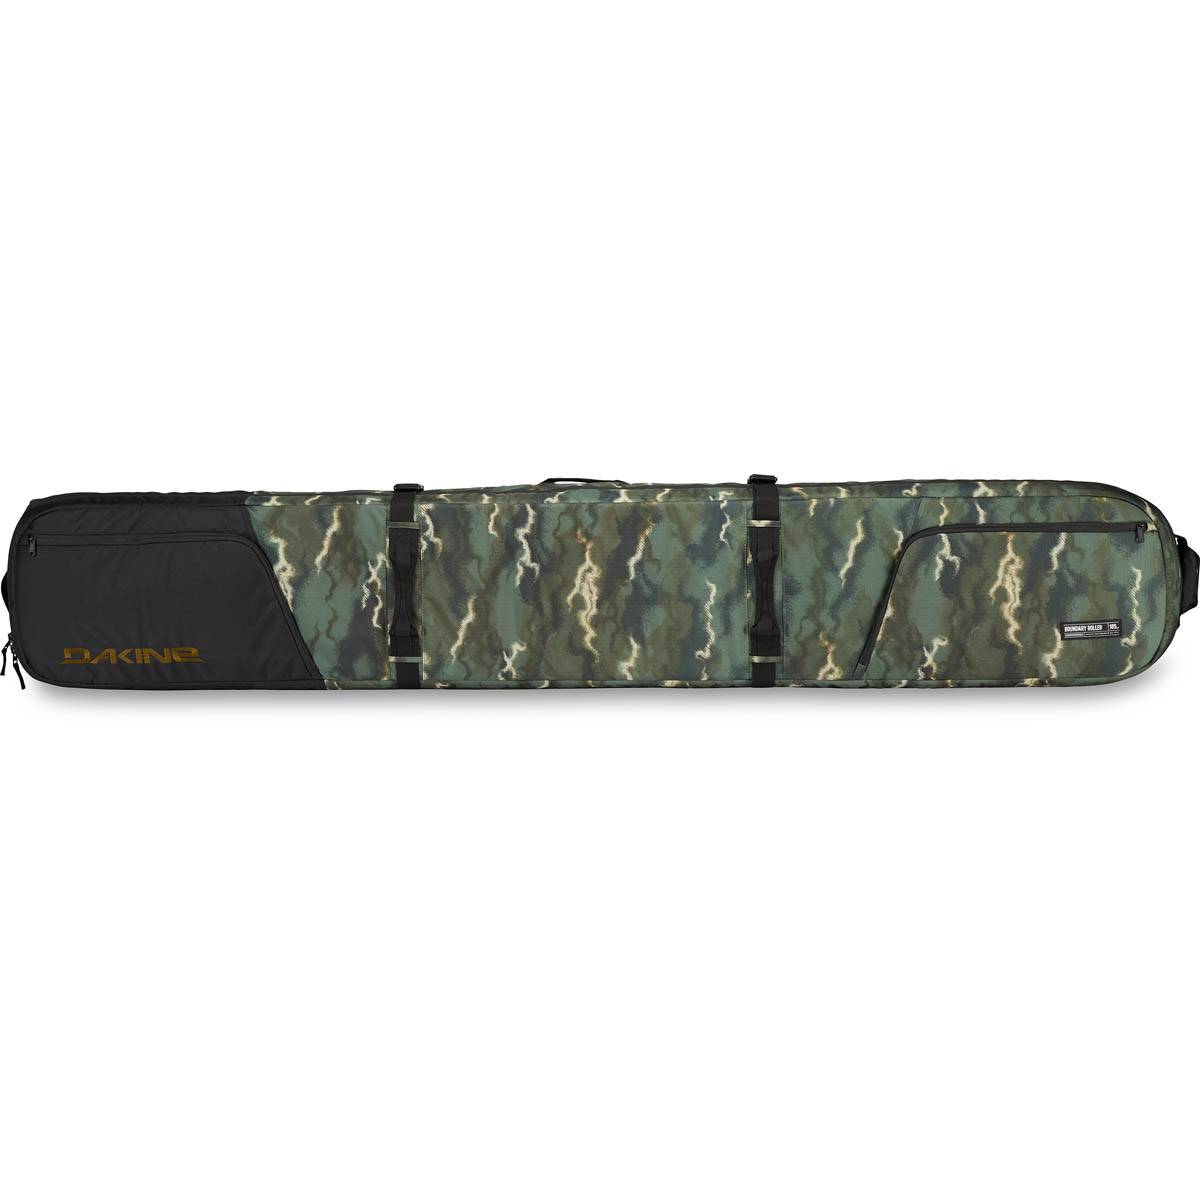 Dakine Boundary Ski Roller Borsa 185 cm Ski Borsa Olive Ashcroft Camo